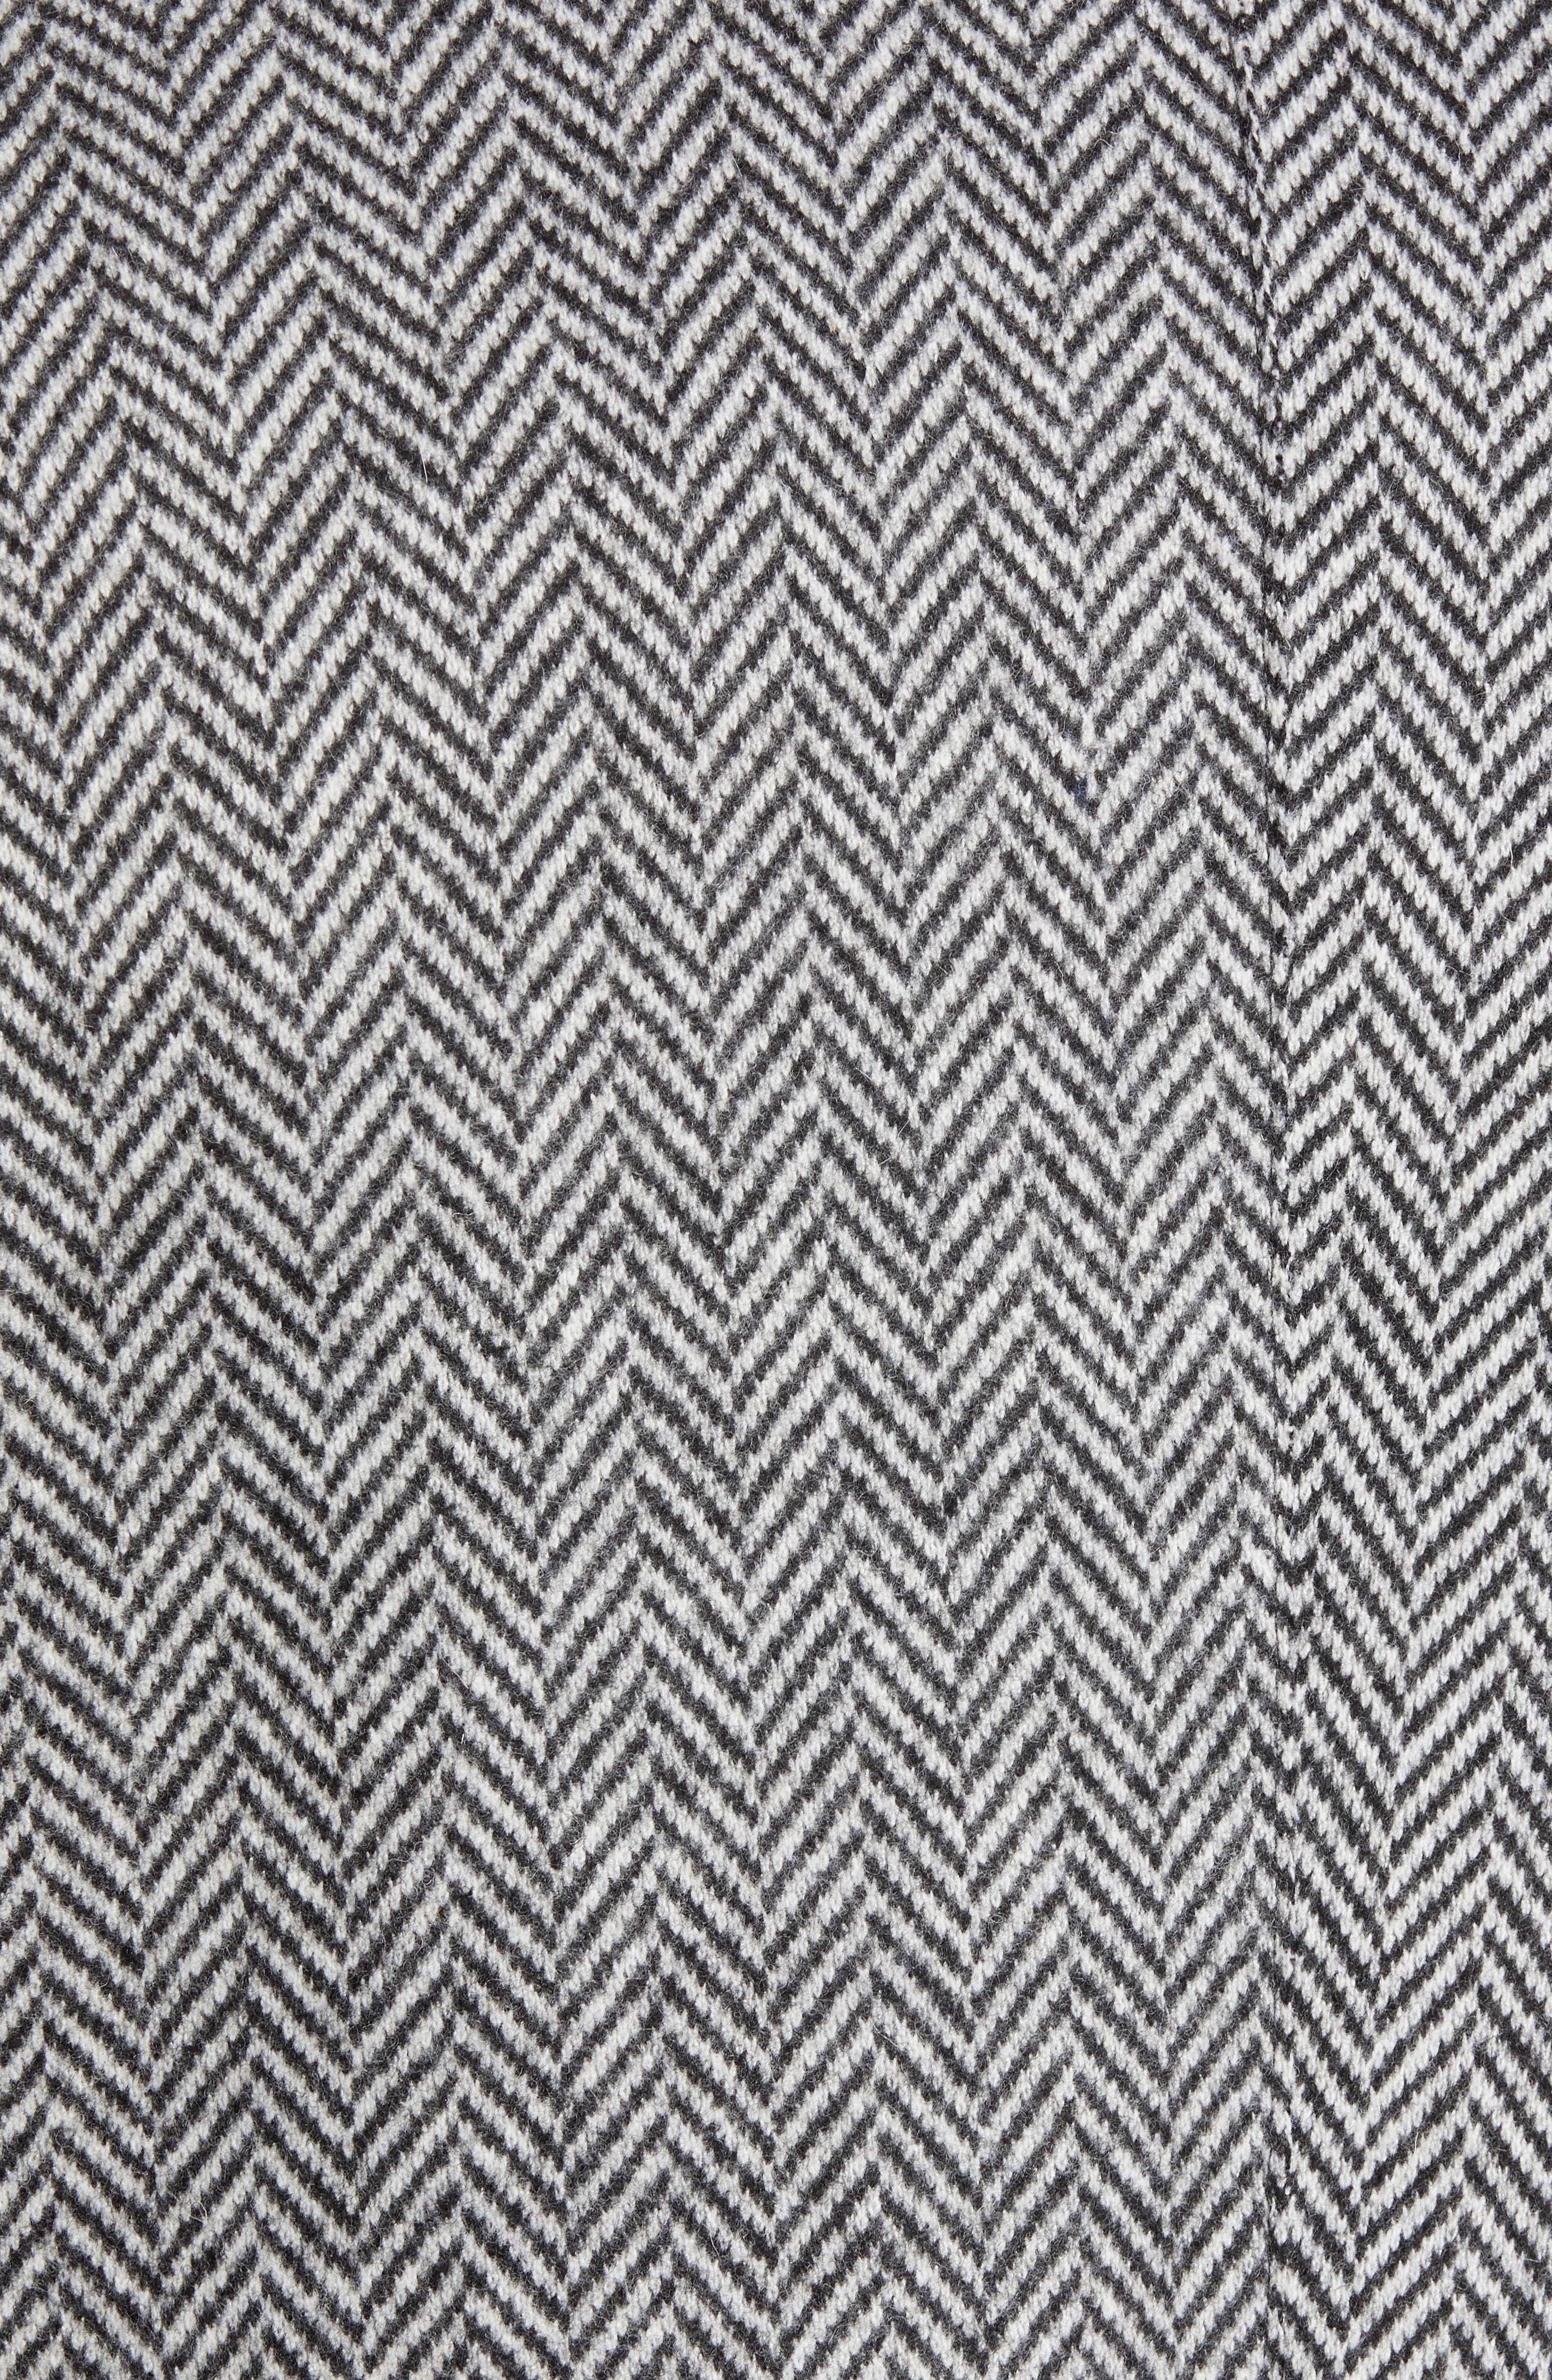 Trim Fit Wool Blend Top Coat,                             Alternate thumbnail 7, color,                             GREY